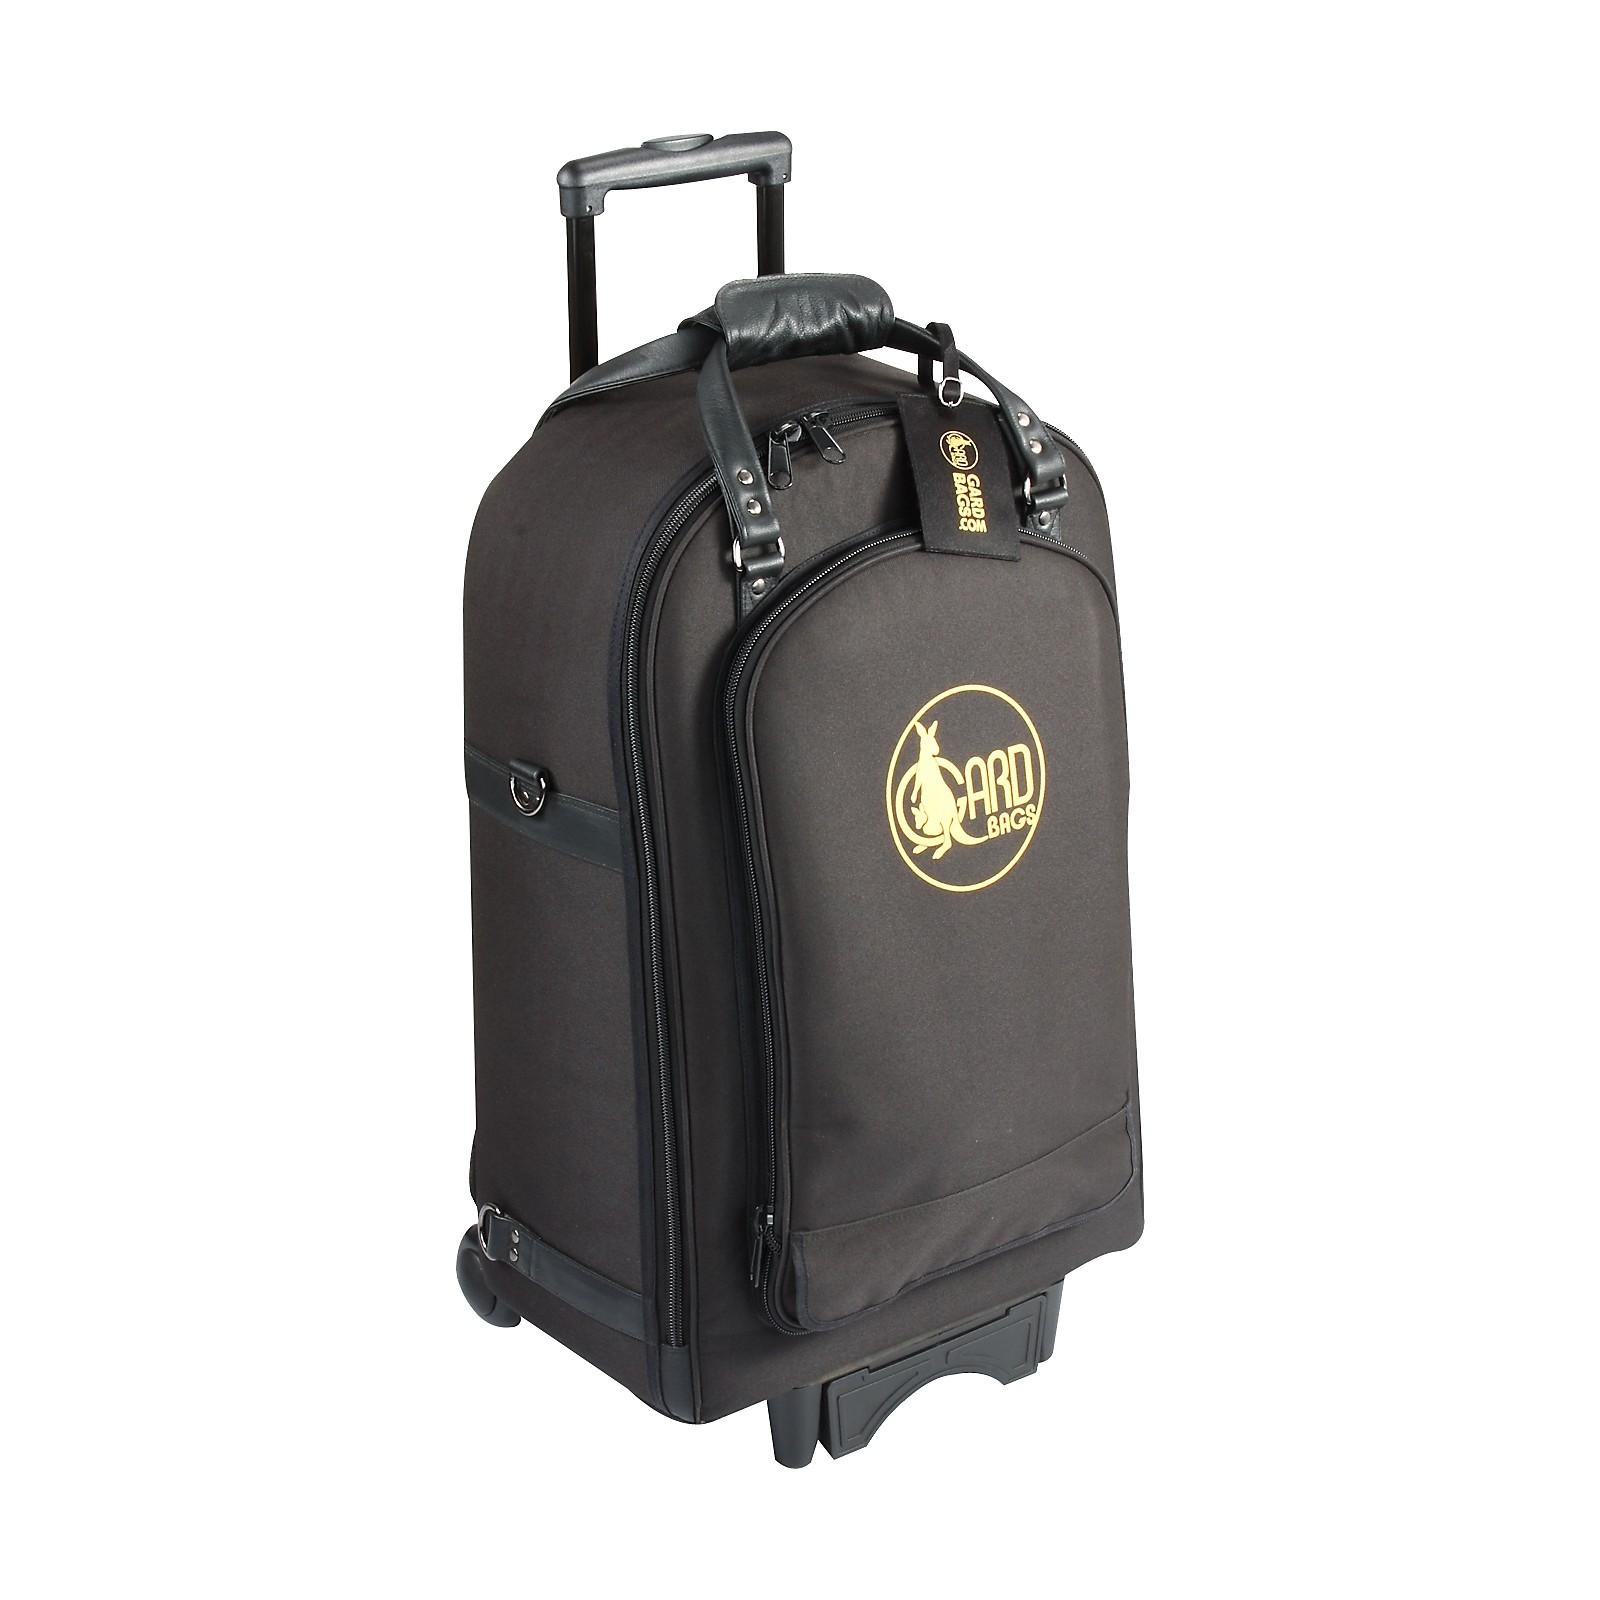 Gard Quad Trumpet Wheelie Bag